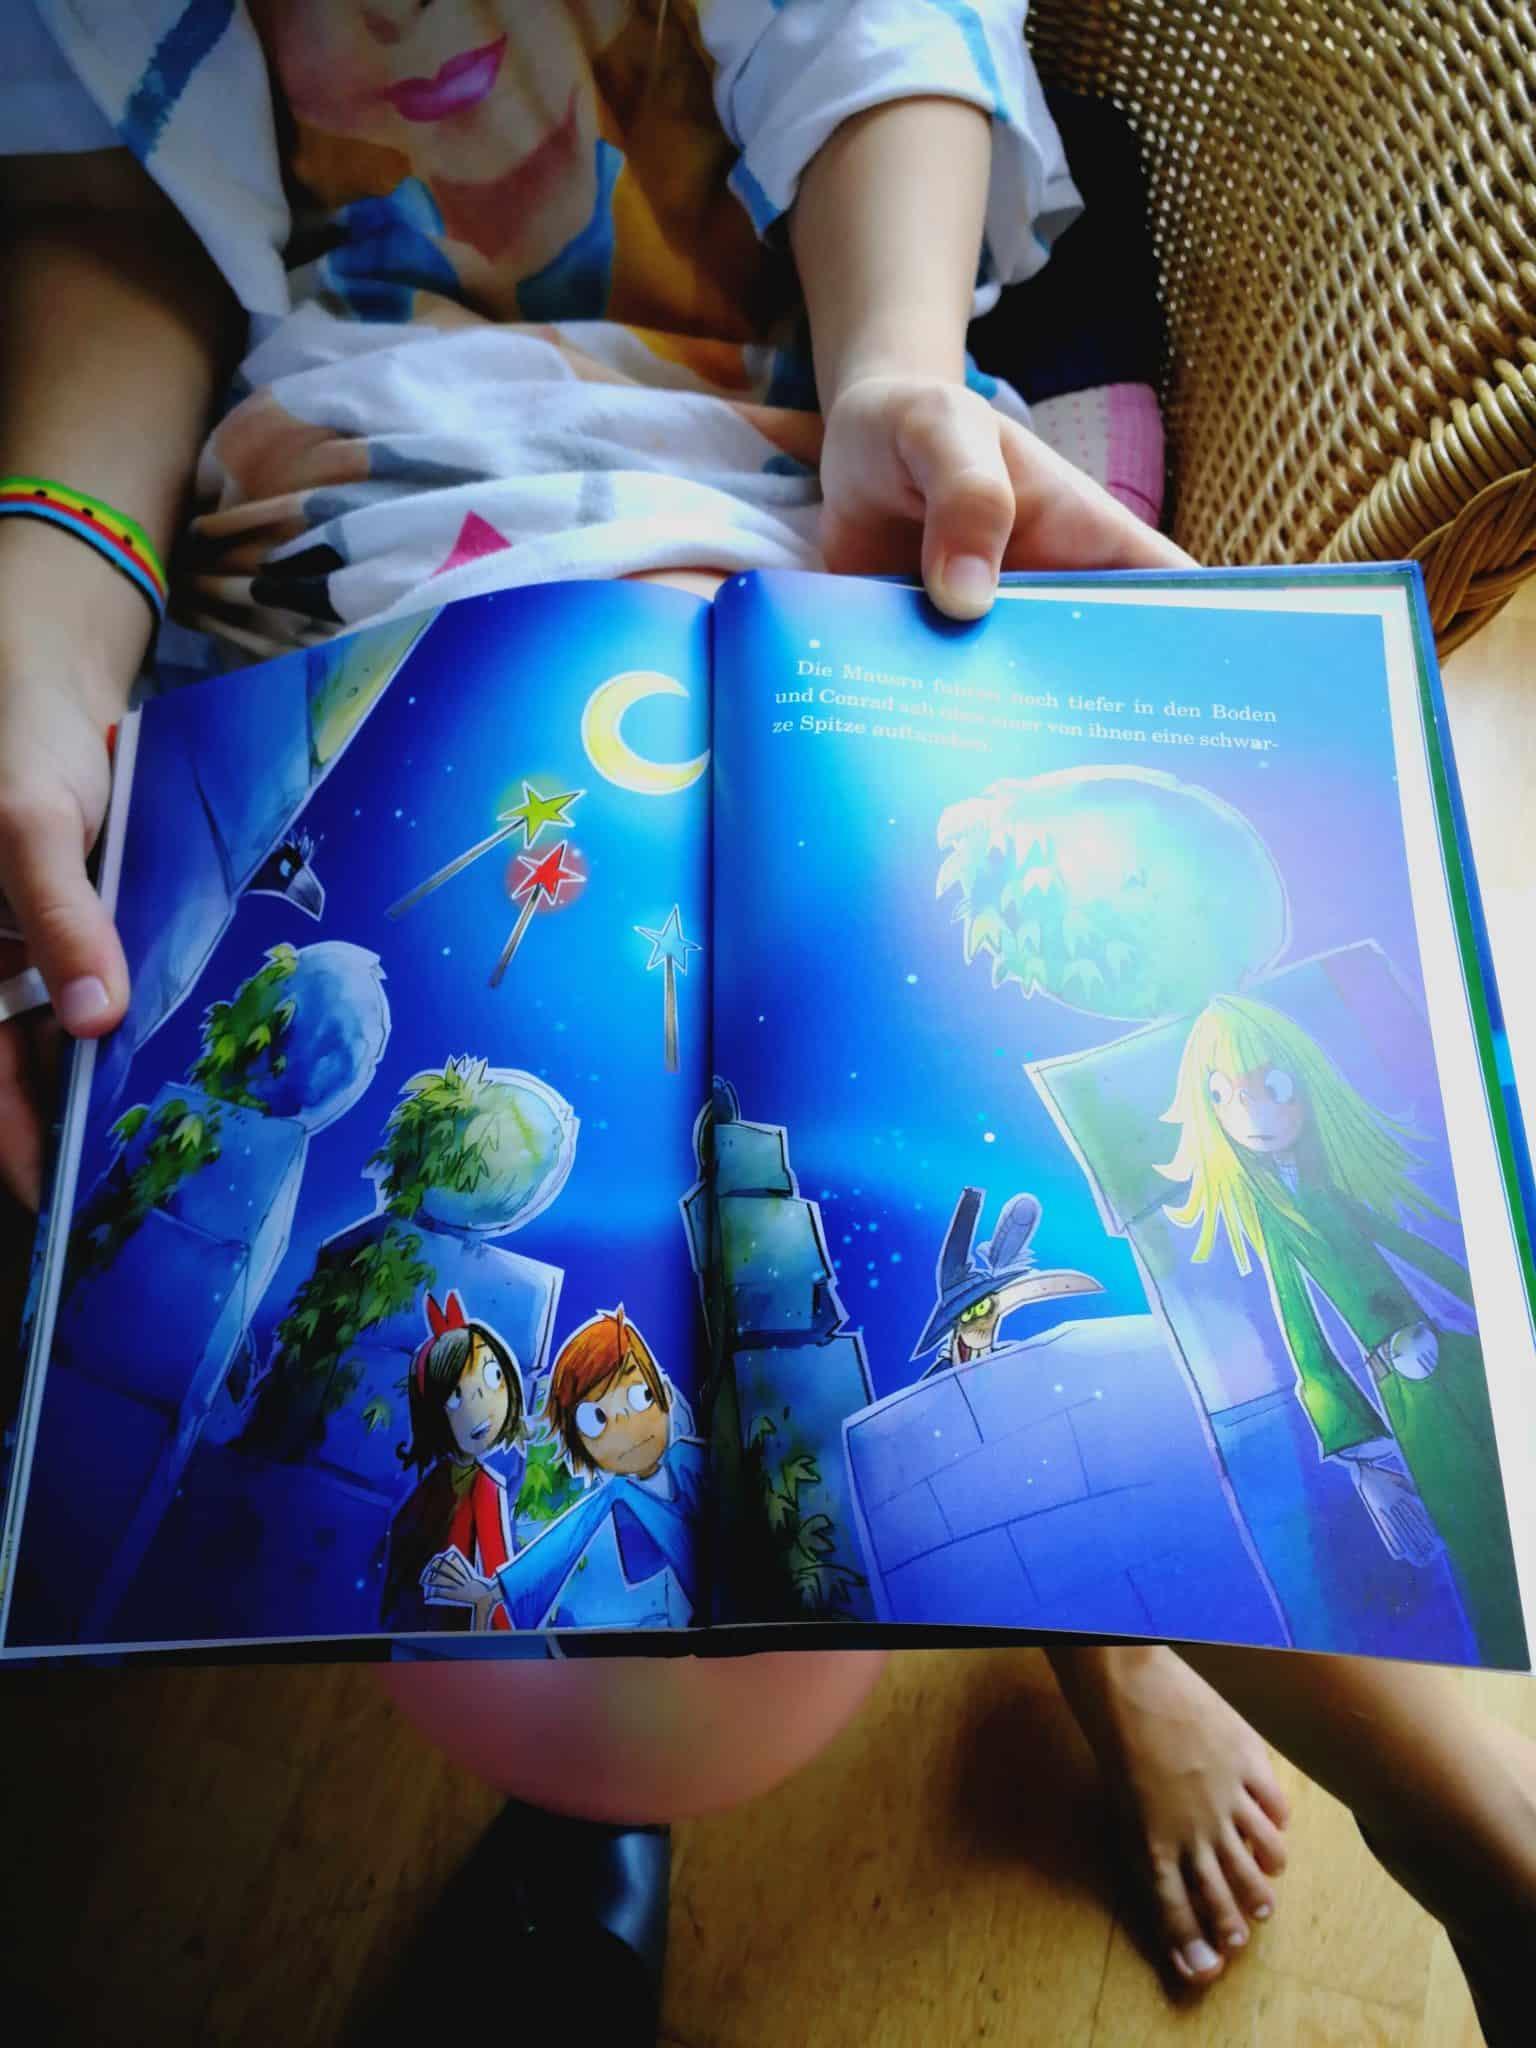 Die drei Magier Buch innendrin